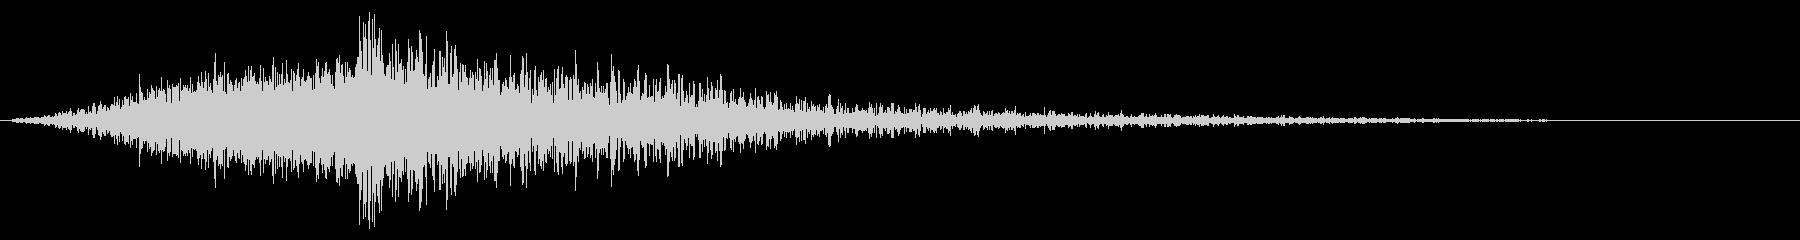 Razor Edge Whooshの未再生の波形